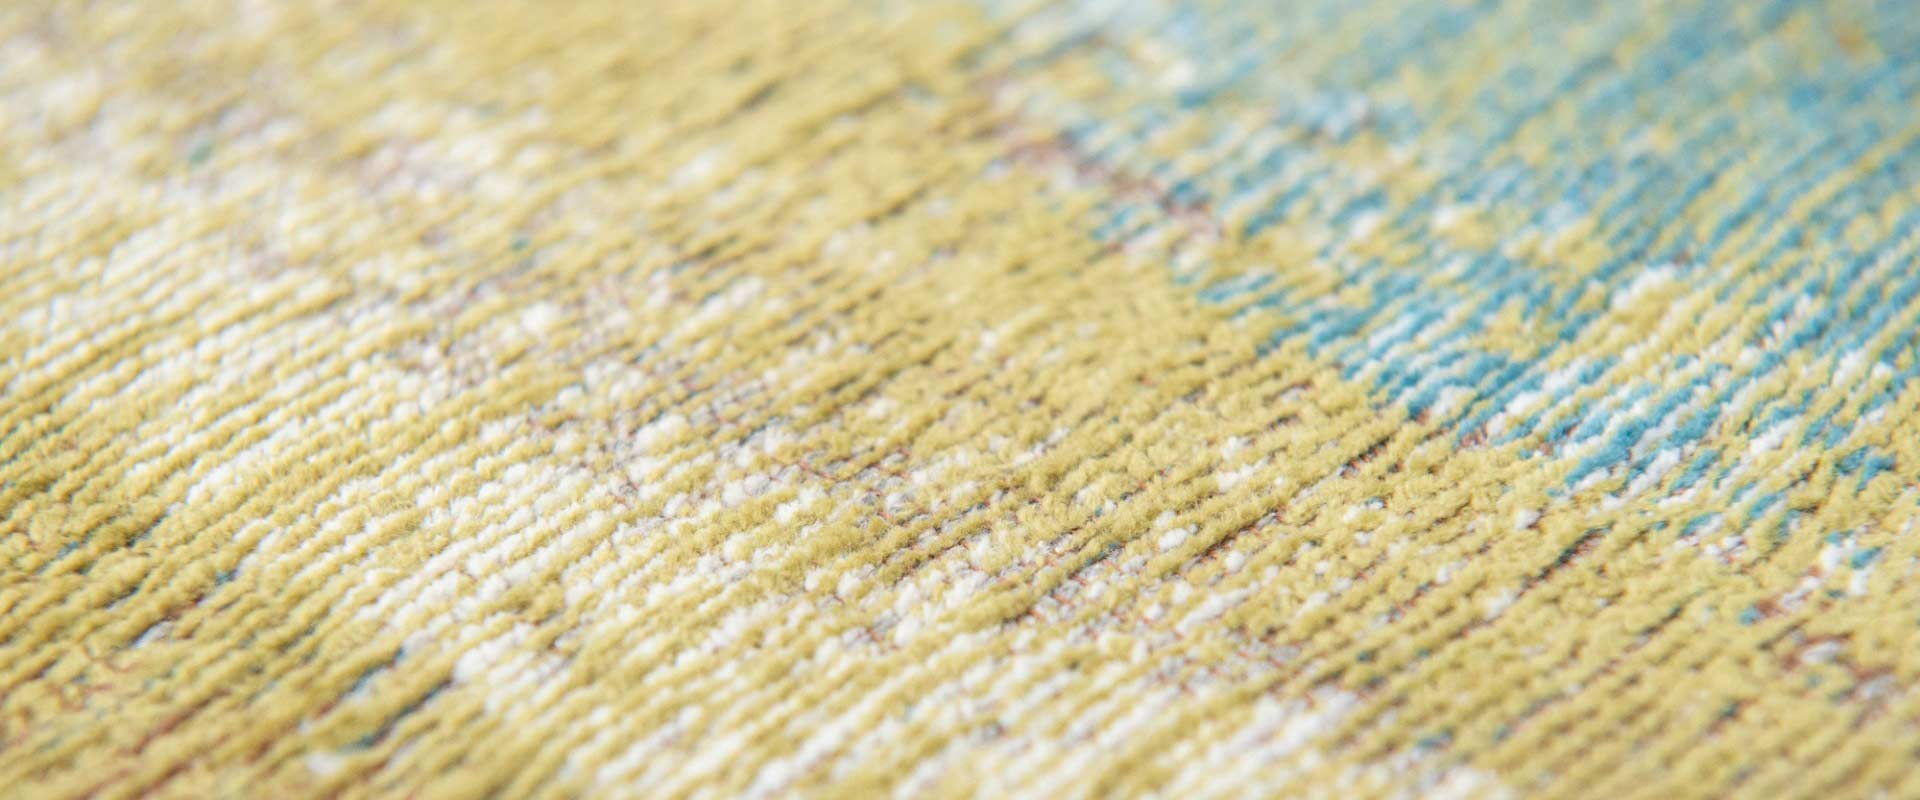 carpette-diapo-image-3